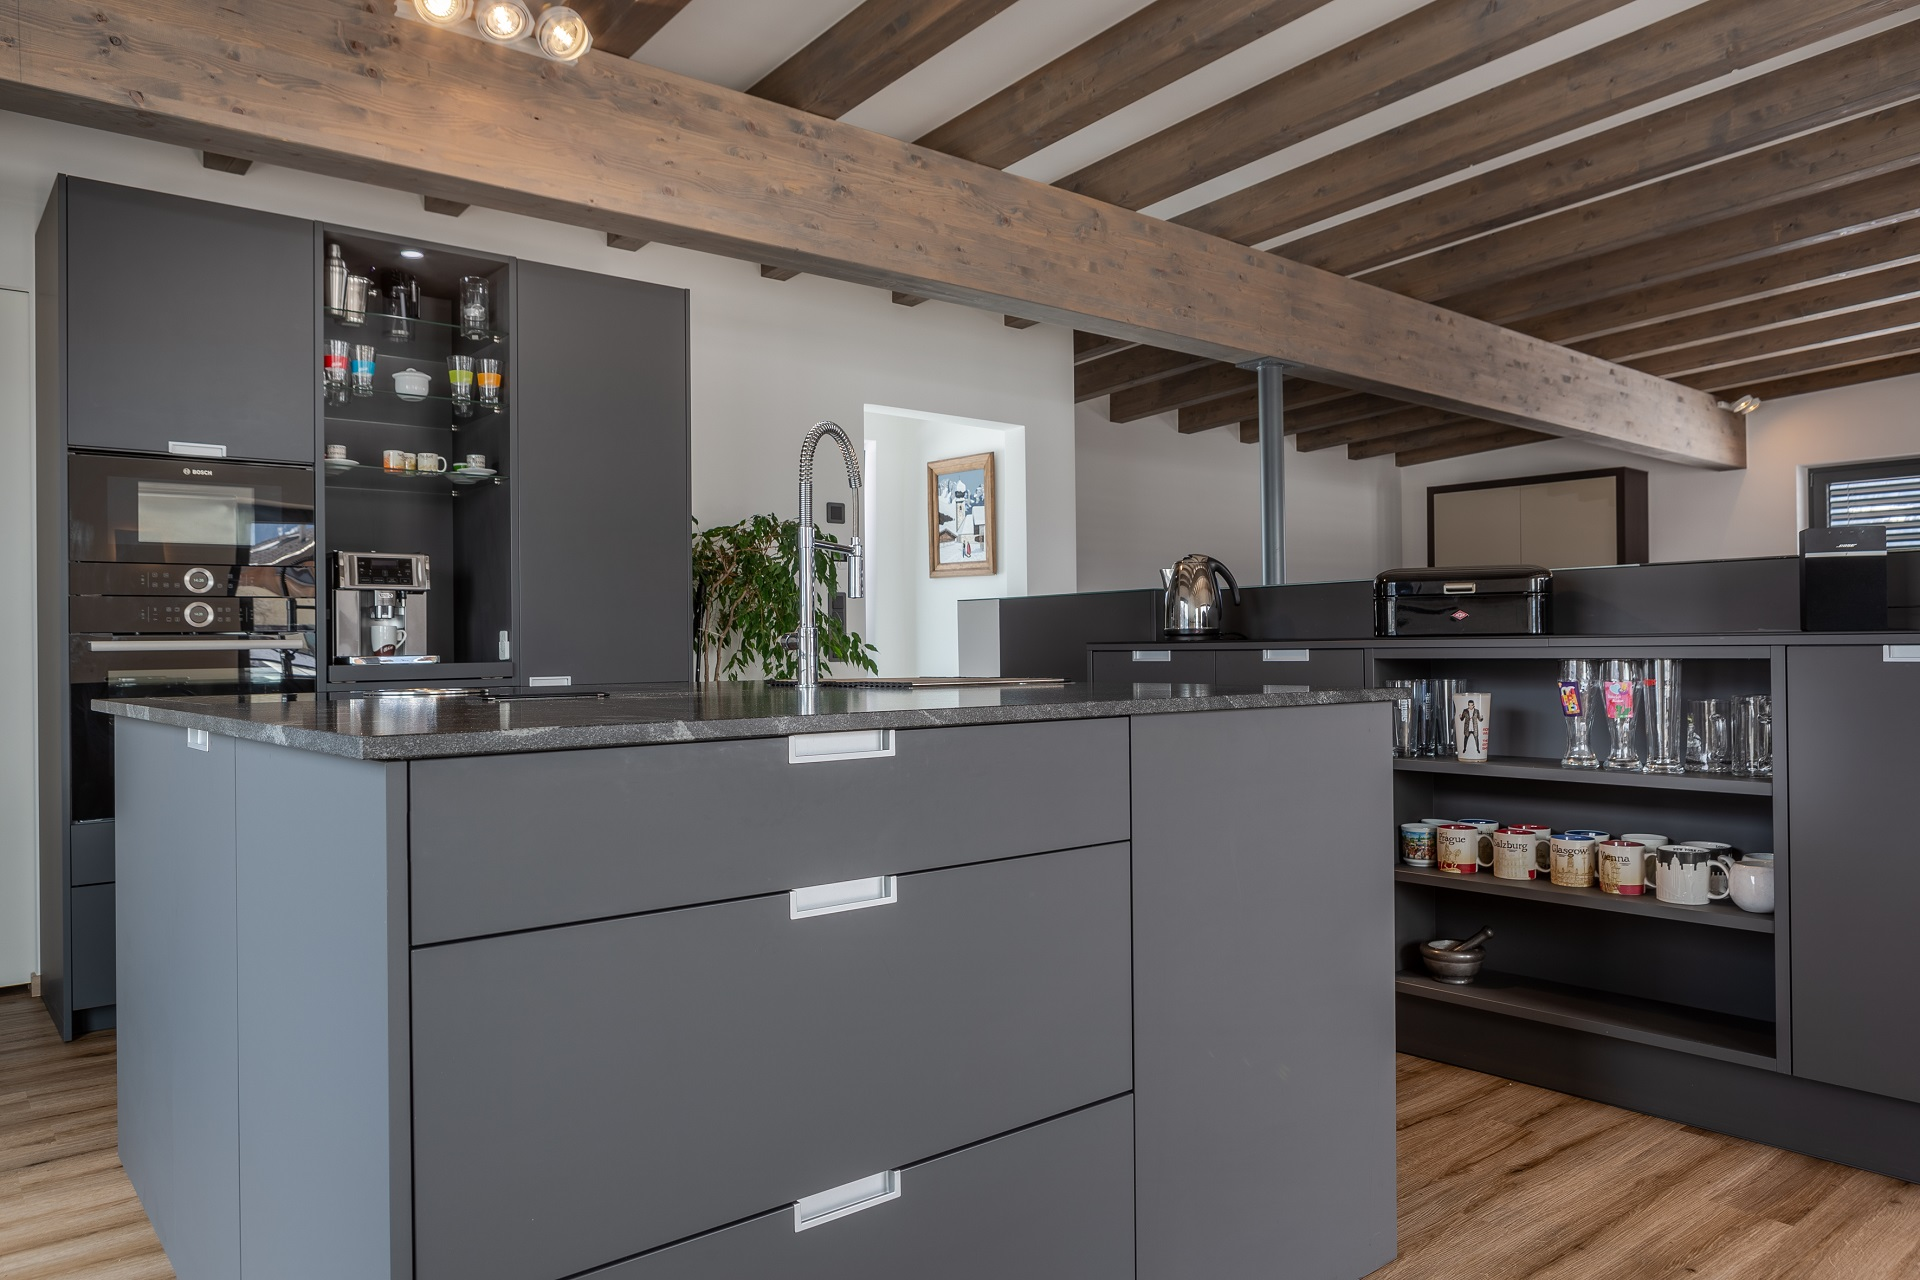 Eggersmann Küche in grau. Geschirr sichtbar